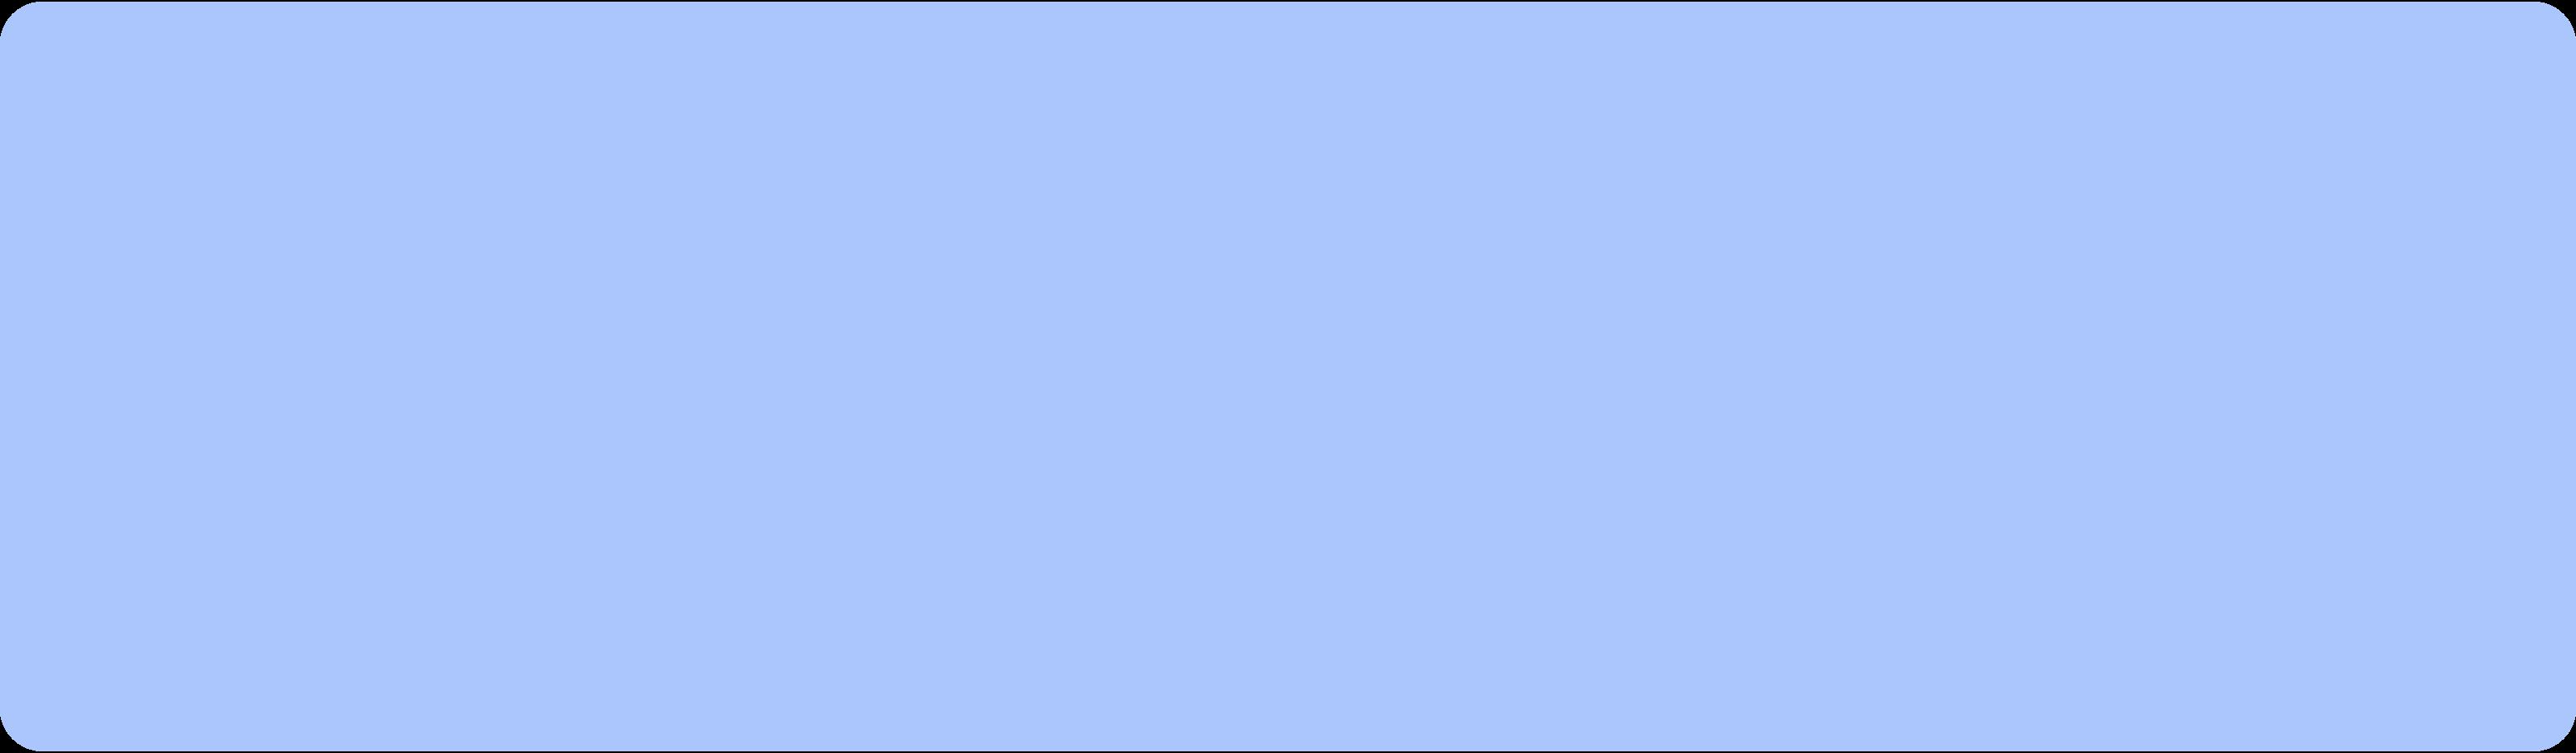 light blue square Clipart illustration in PNG, SVG